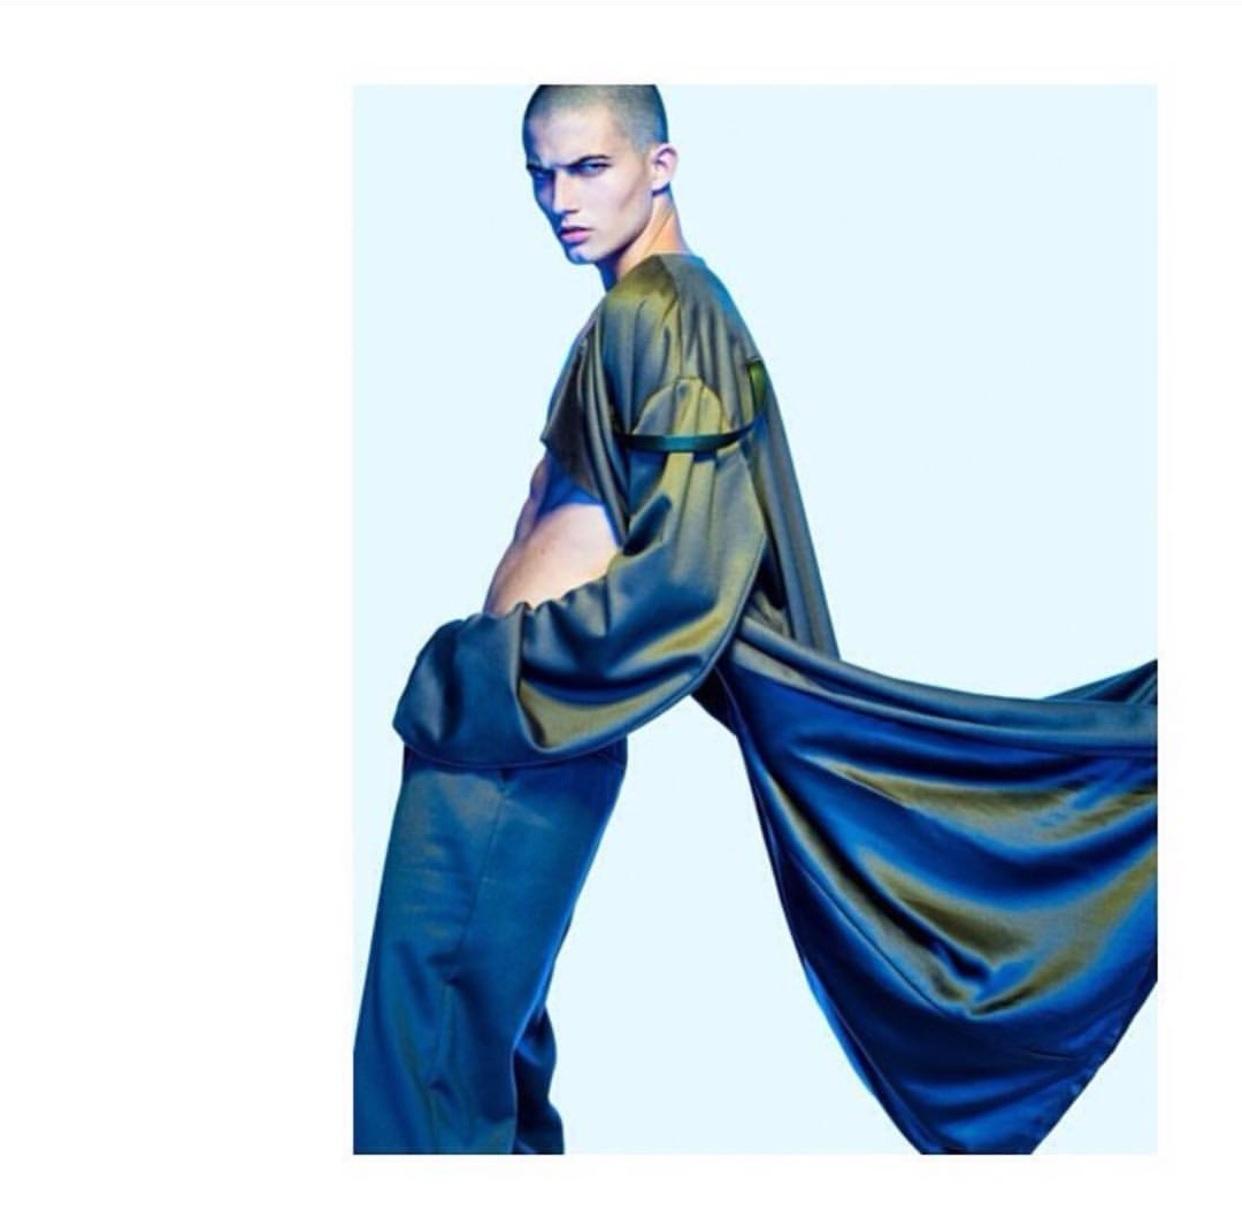 Photographer   Benedict Evans   Hair Stylist   Ben Martin   Stylist   Asamaria Camnert   Model   Alex Corporan